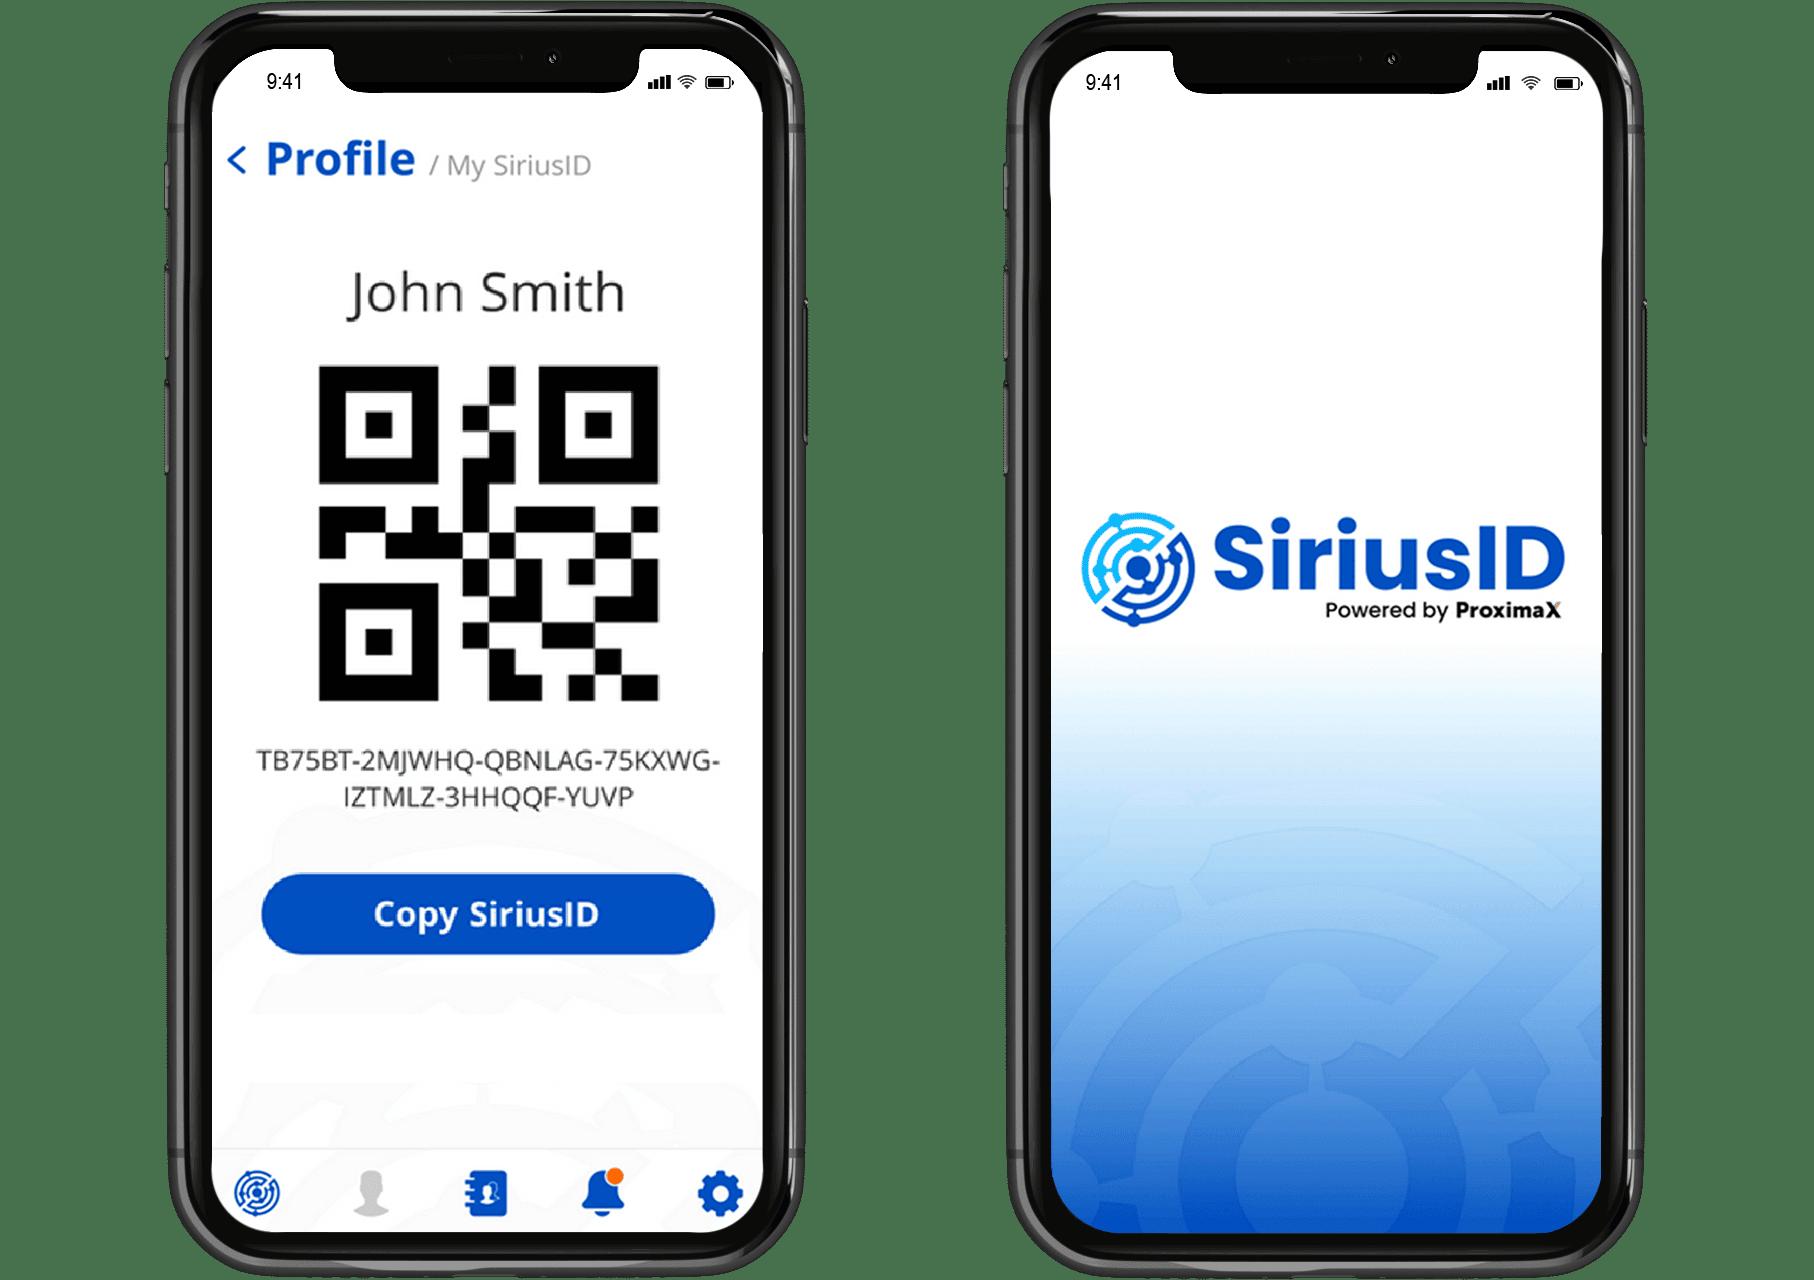 siriusID proximax blockchain app